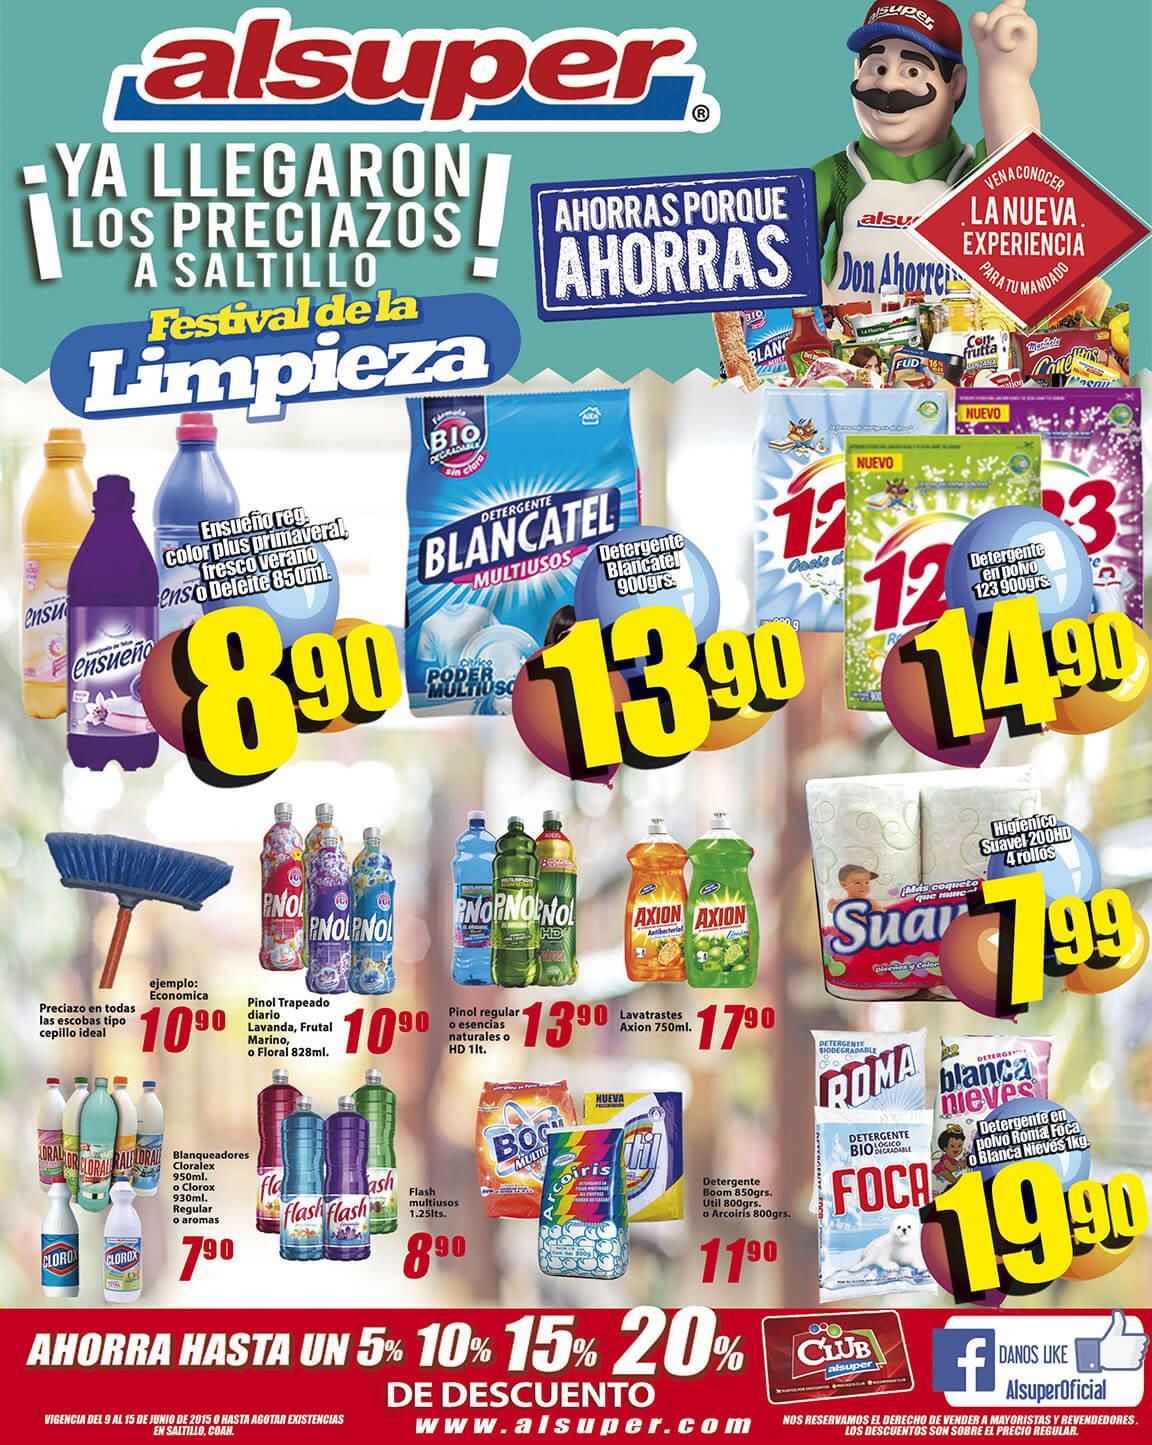 Alsuper: Folleto Festival de la Limpieza